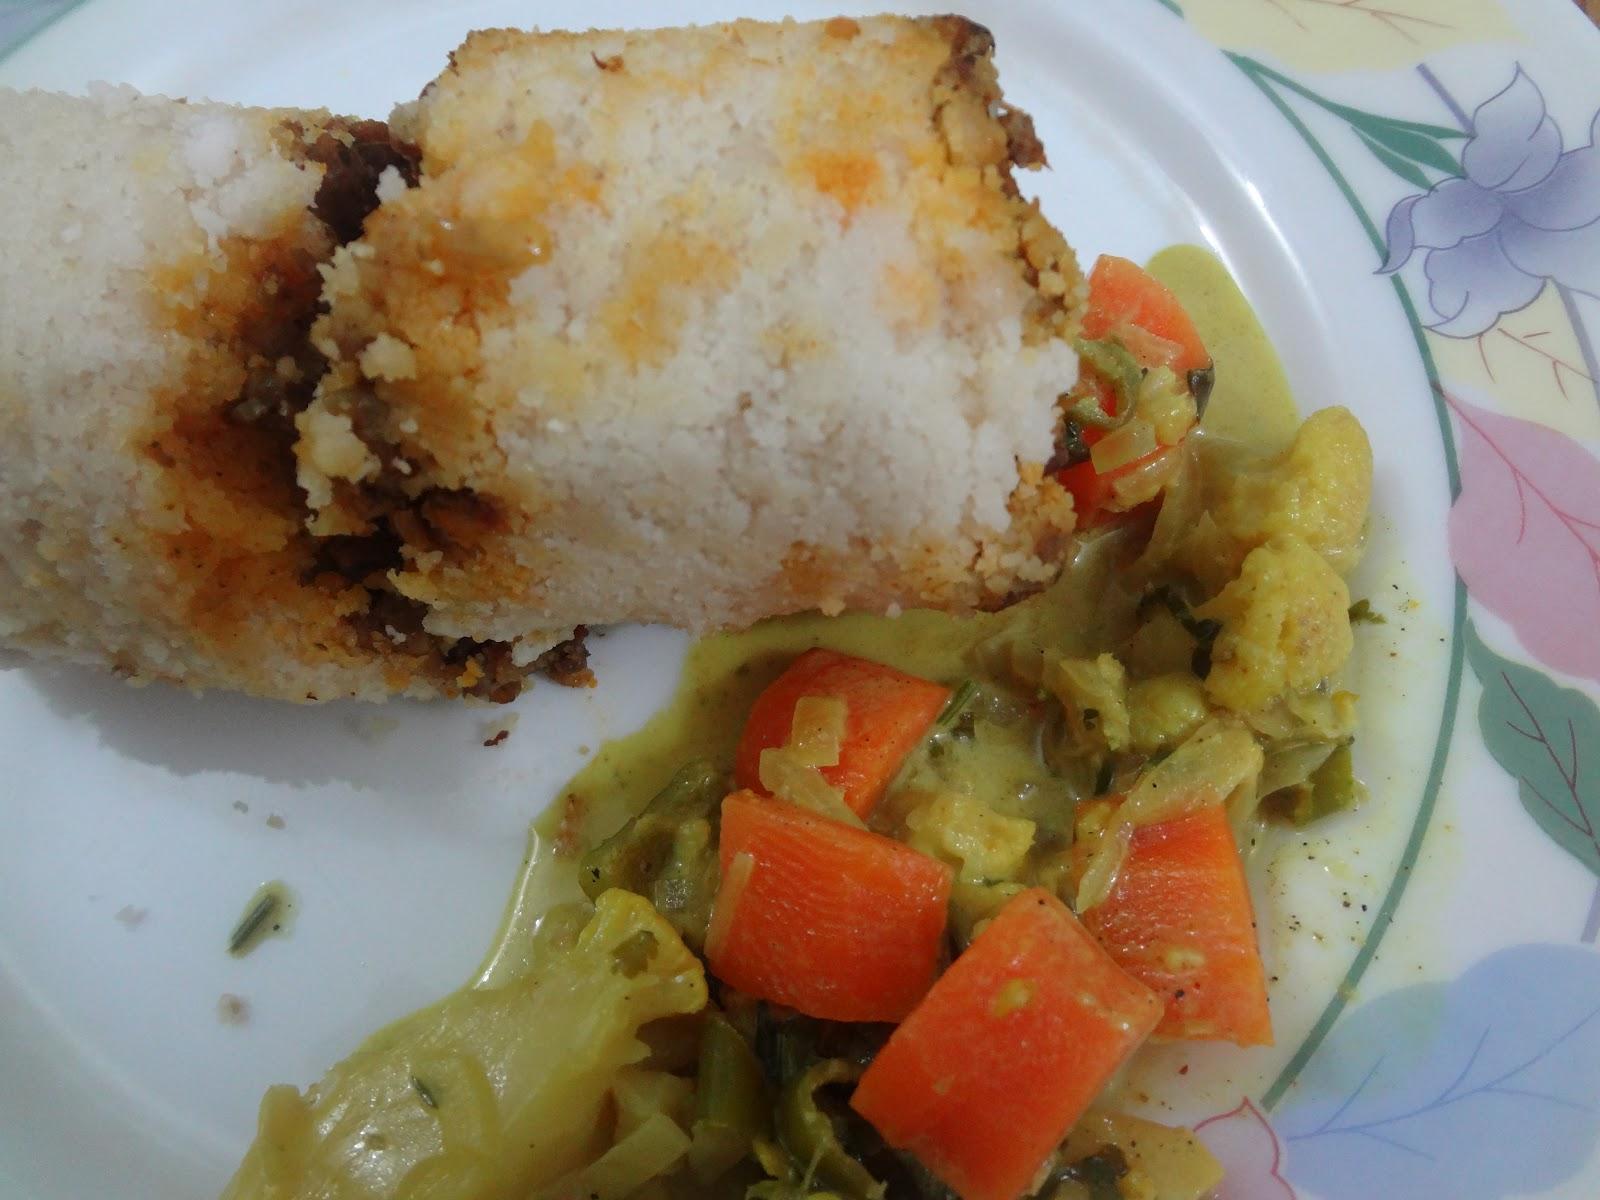 Layer Cake Recipe In Malayalam: Shocks And Shoes: Journal Your Ramadan